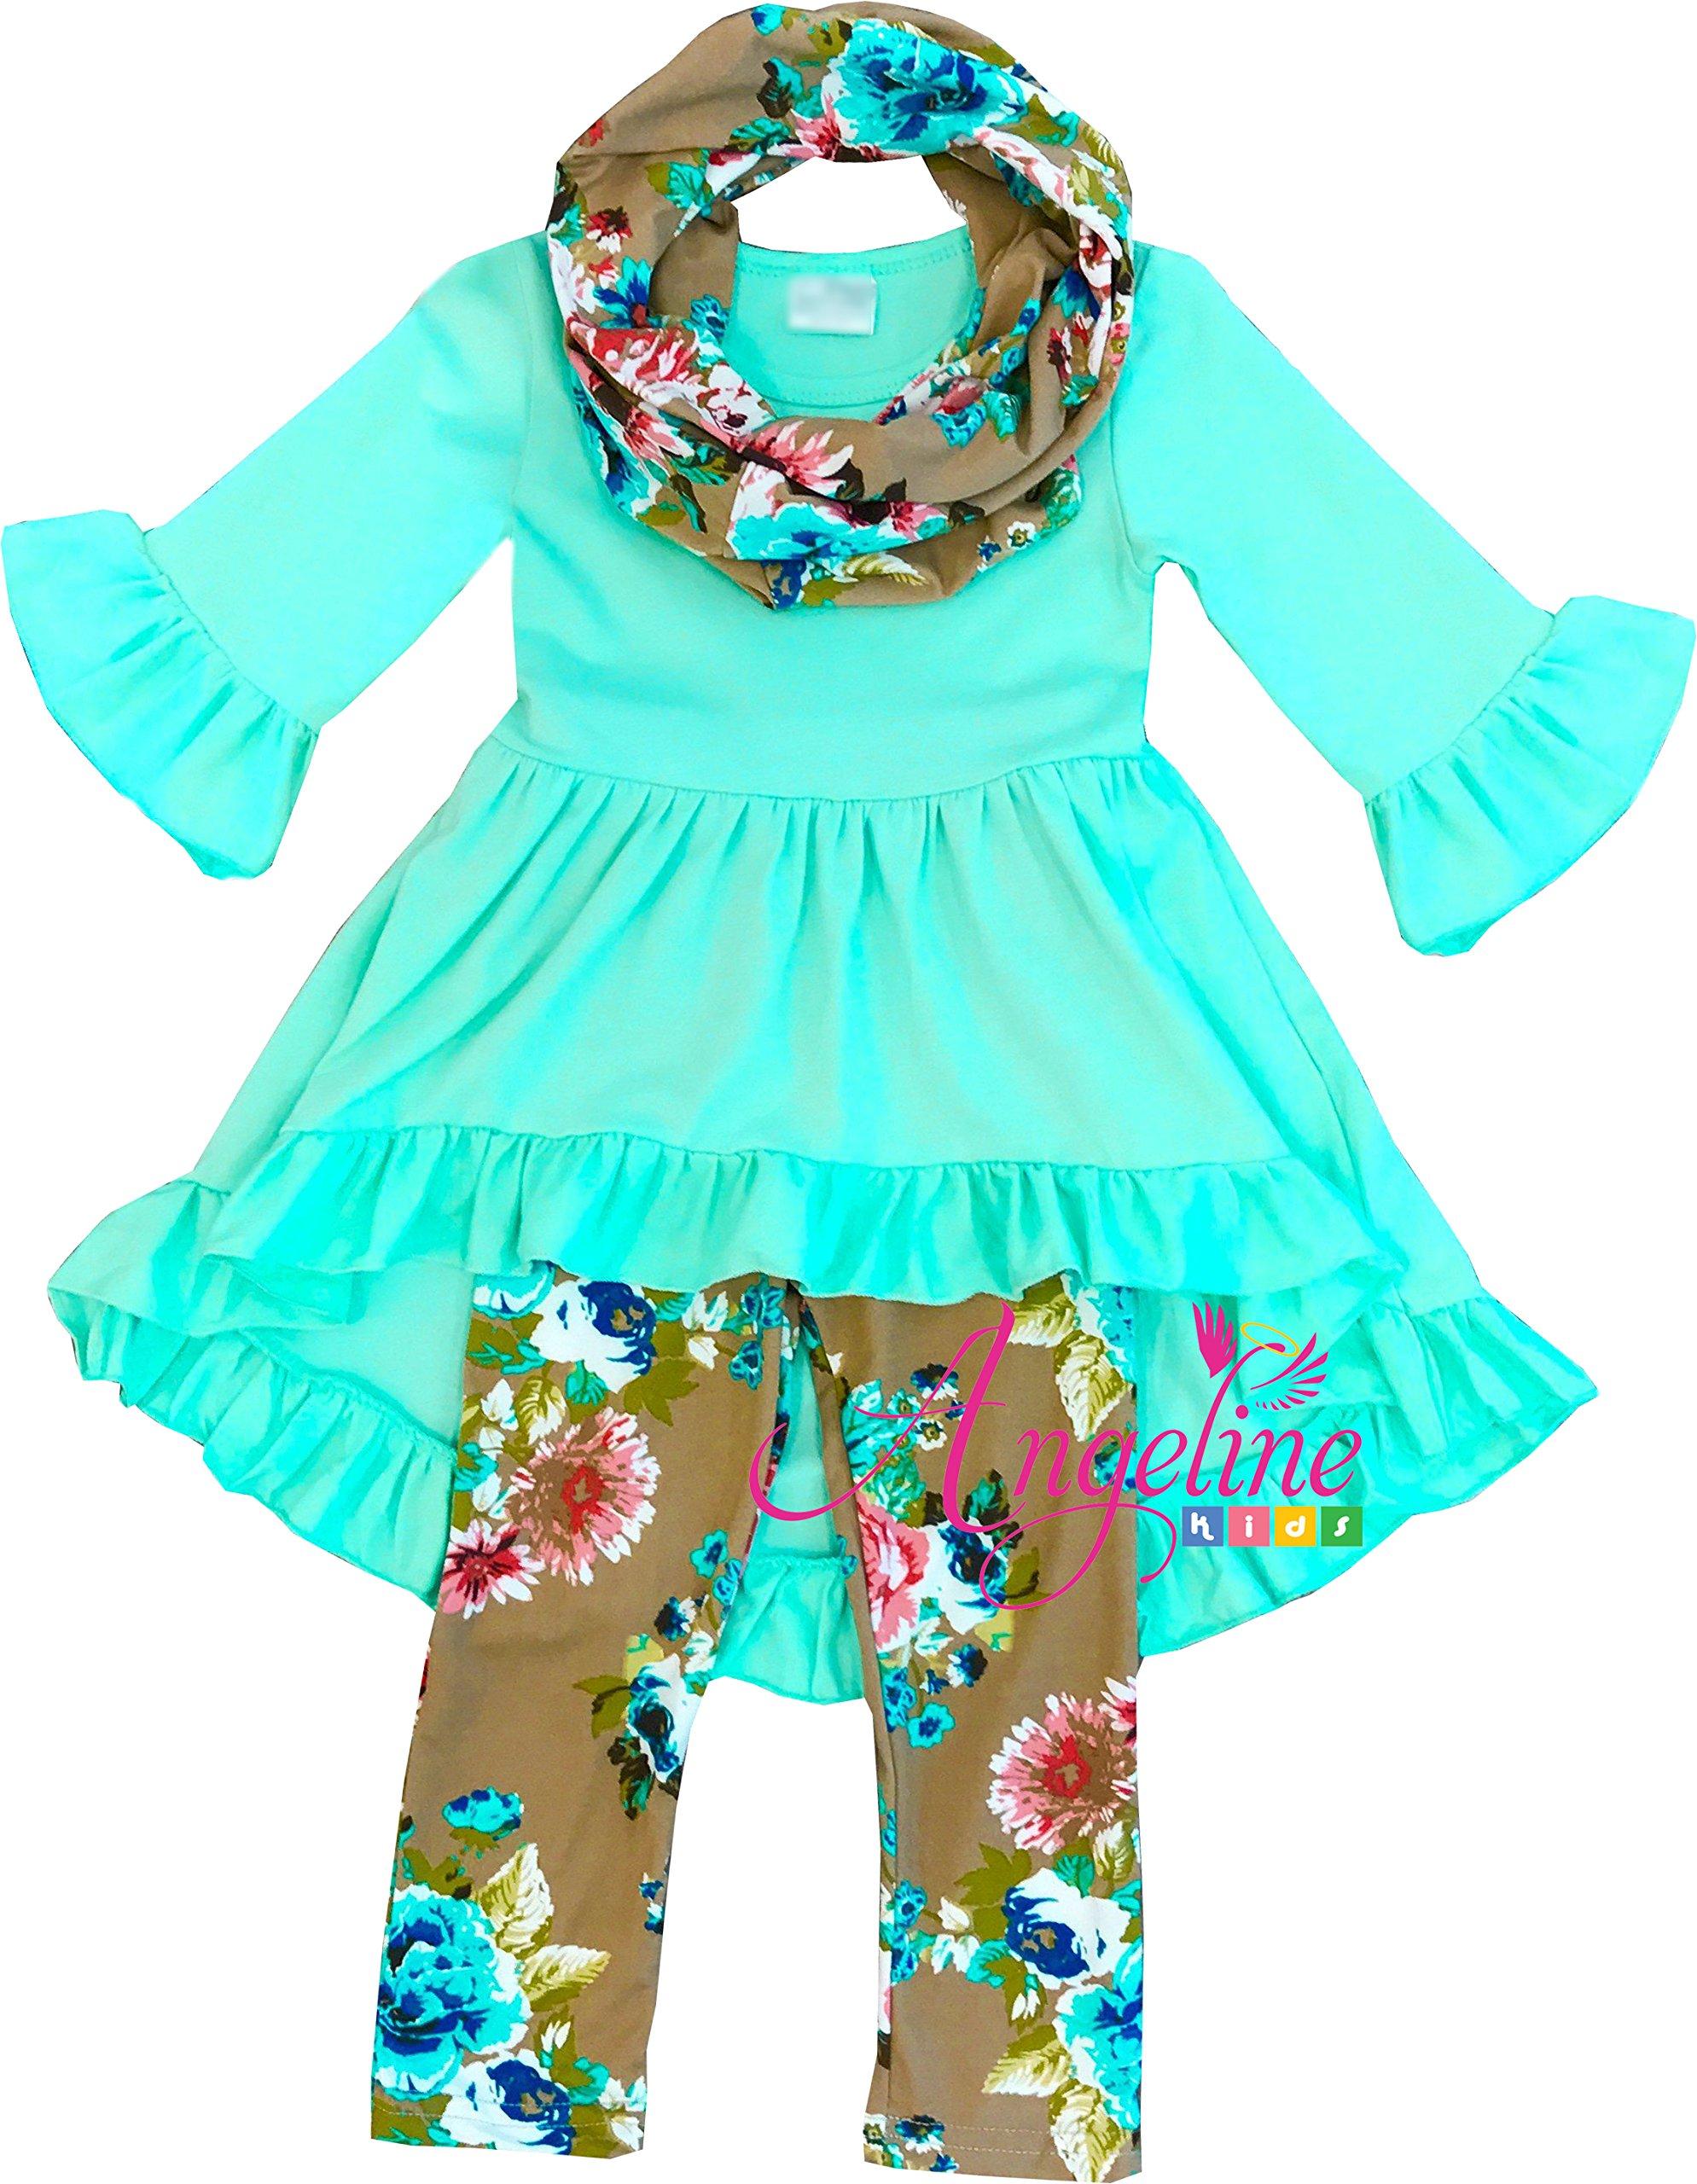 Angeline Boutique Clothing Spring Easter Vintage Floral Mint Green Scarf Set 6X/2XL